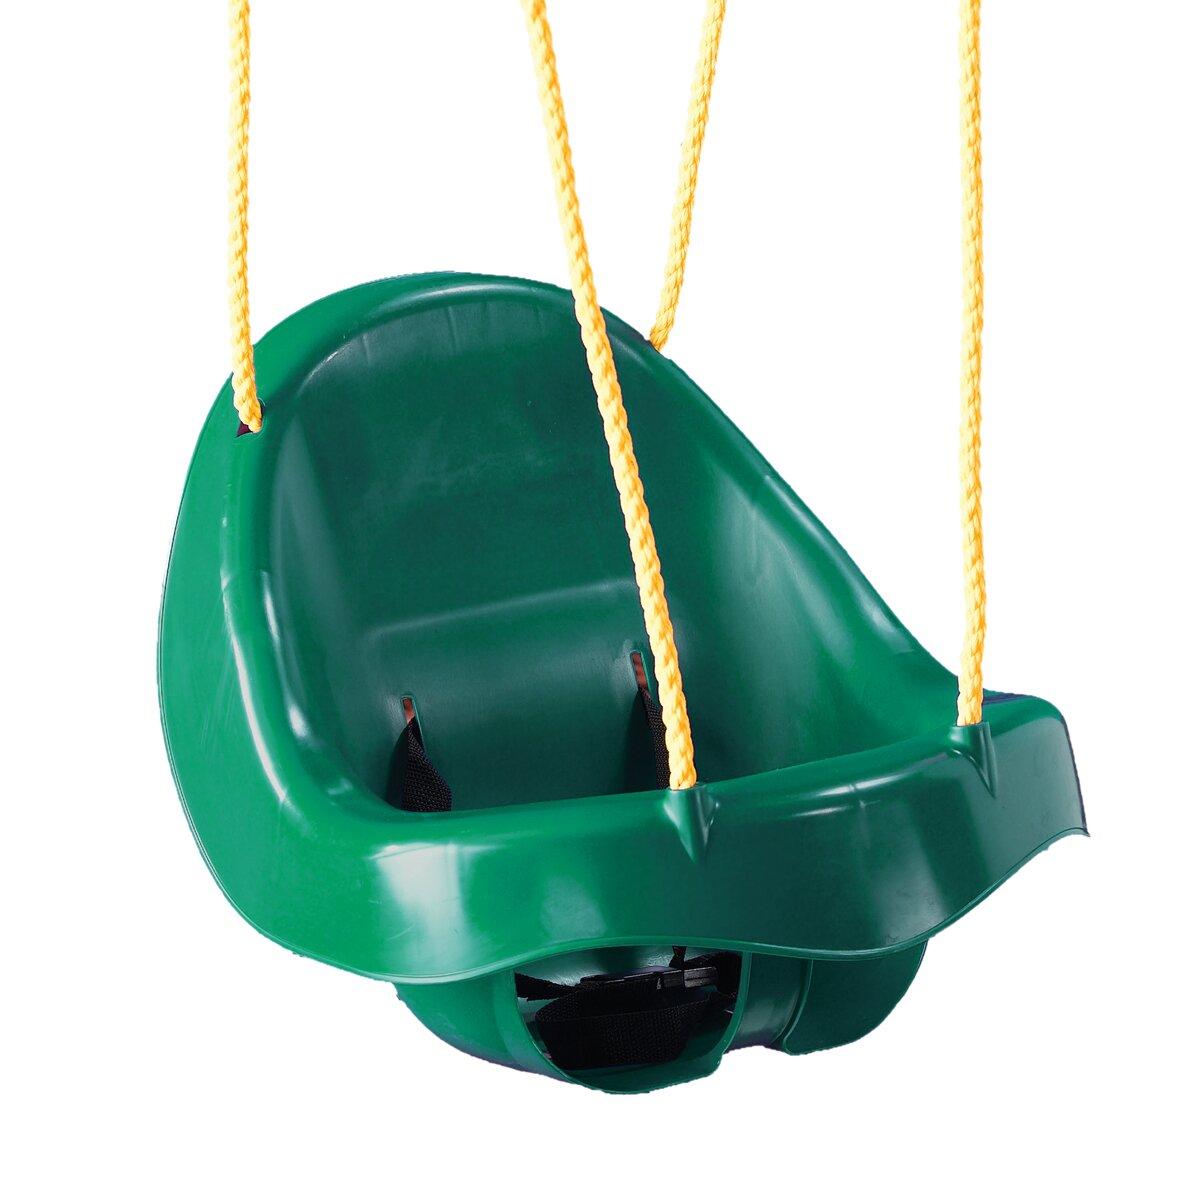 Swing N Slide Child Seat Swing Seat Amp Reviews Wayfair